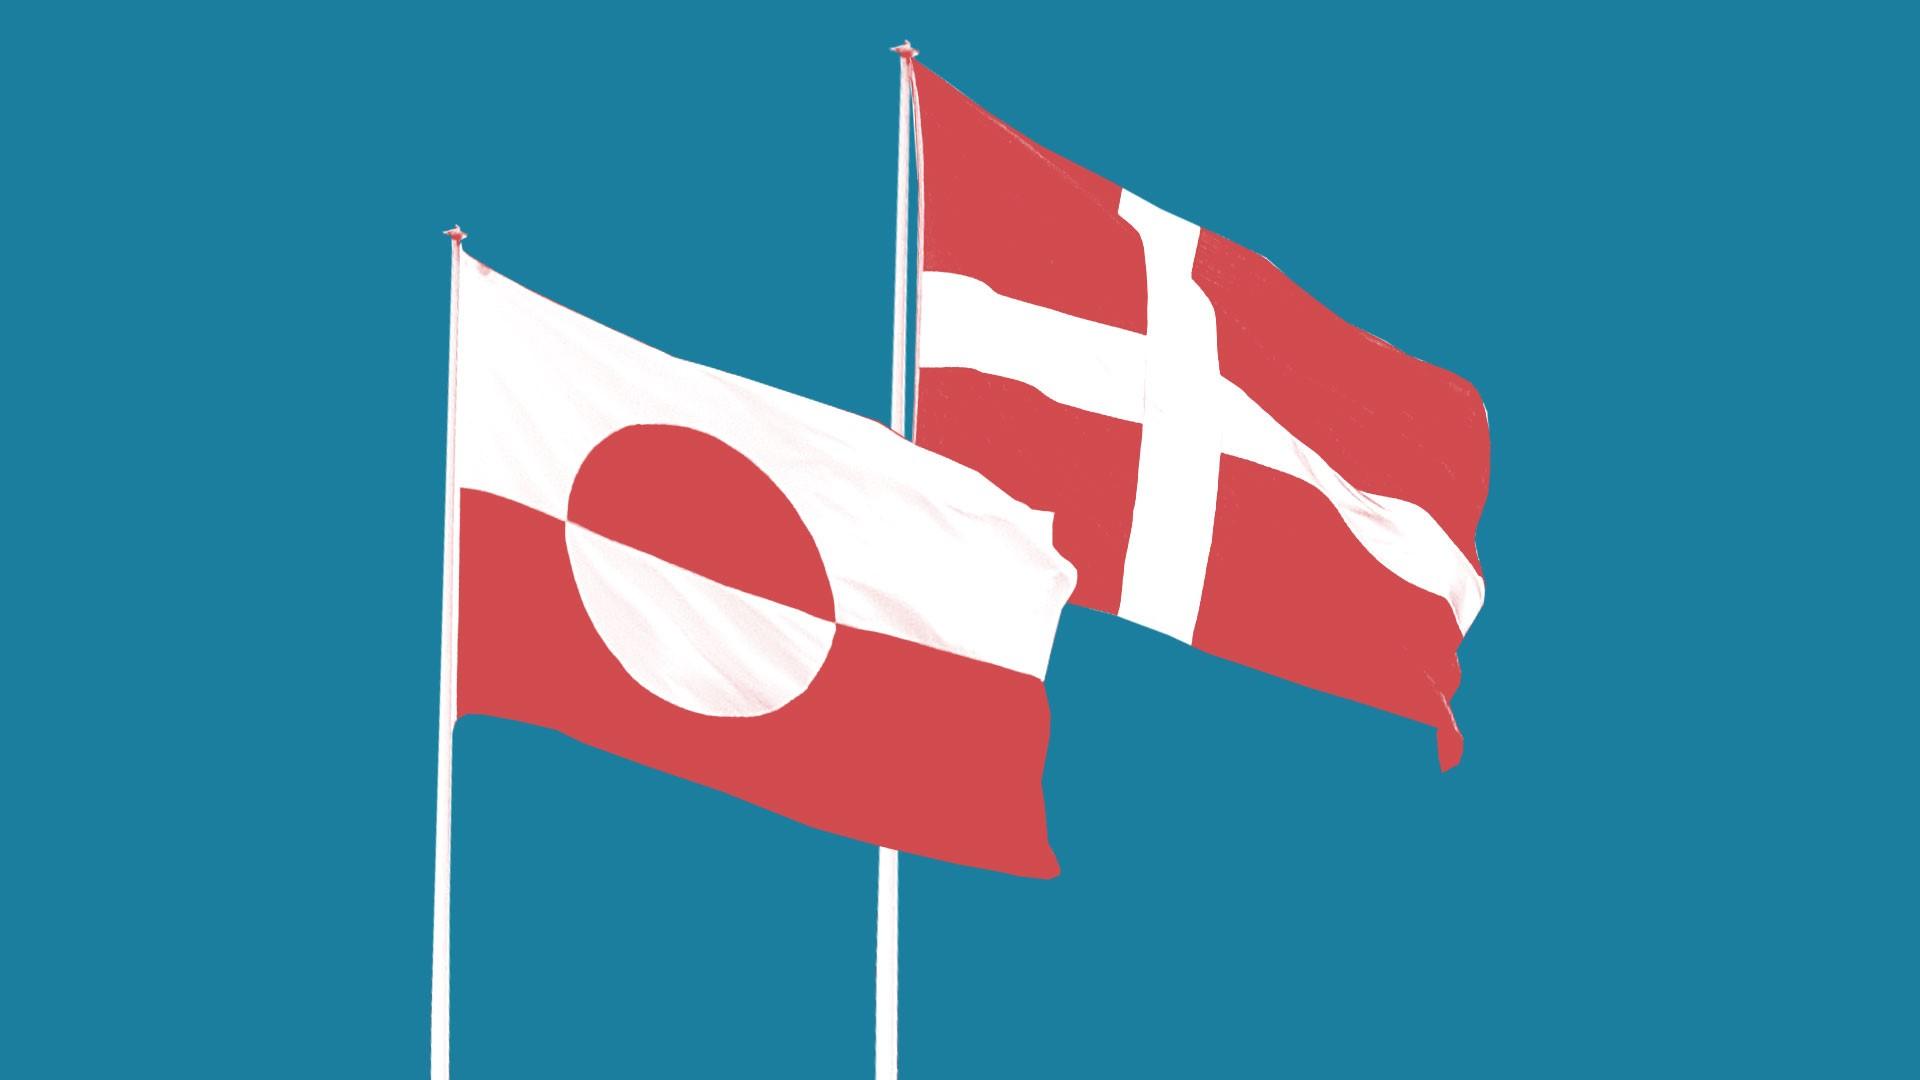 danmark-groenland_0.jpg